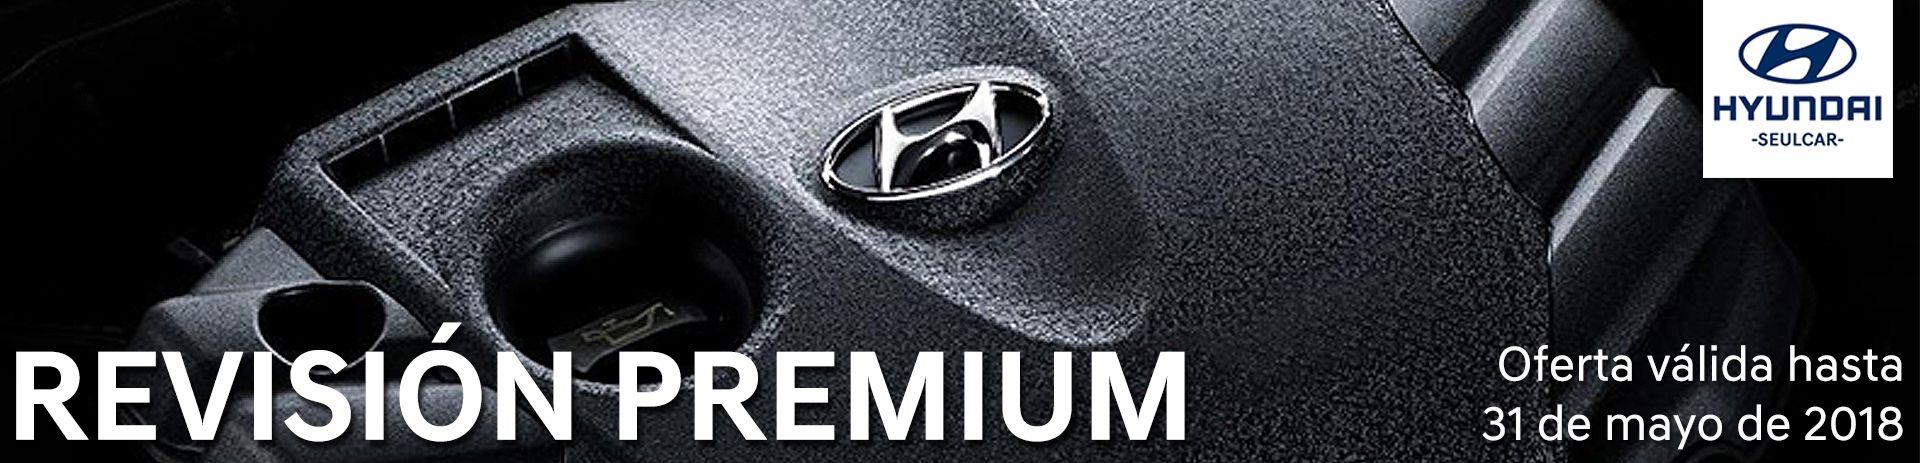 Revision Premium Hyundai Seulcar